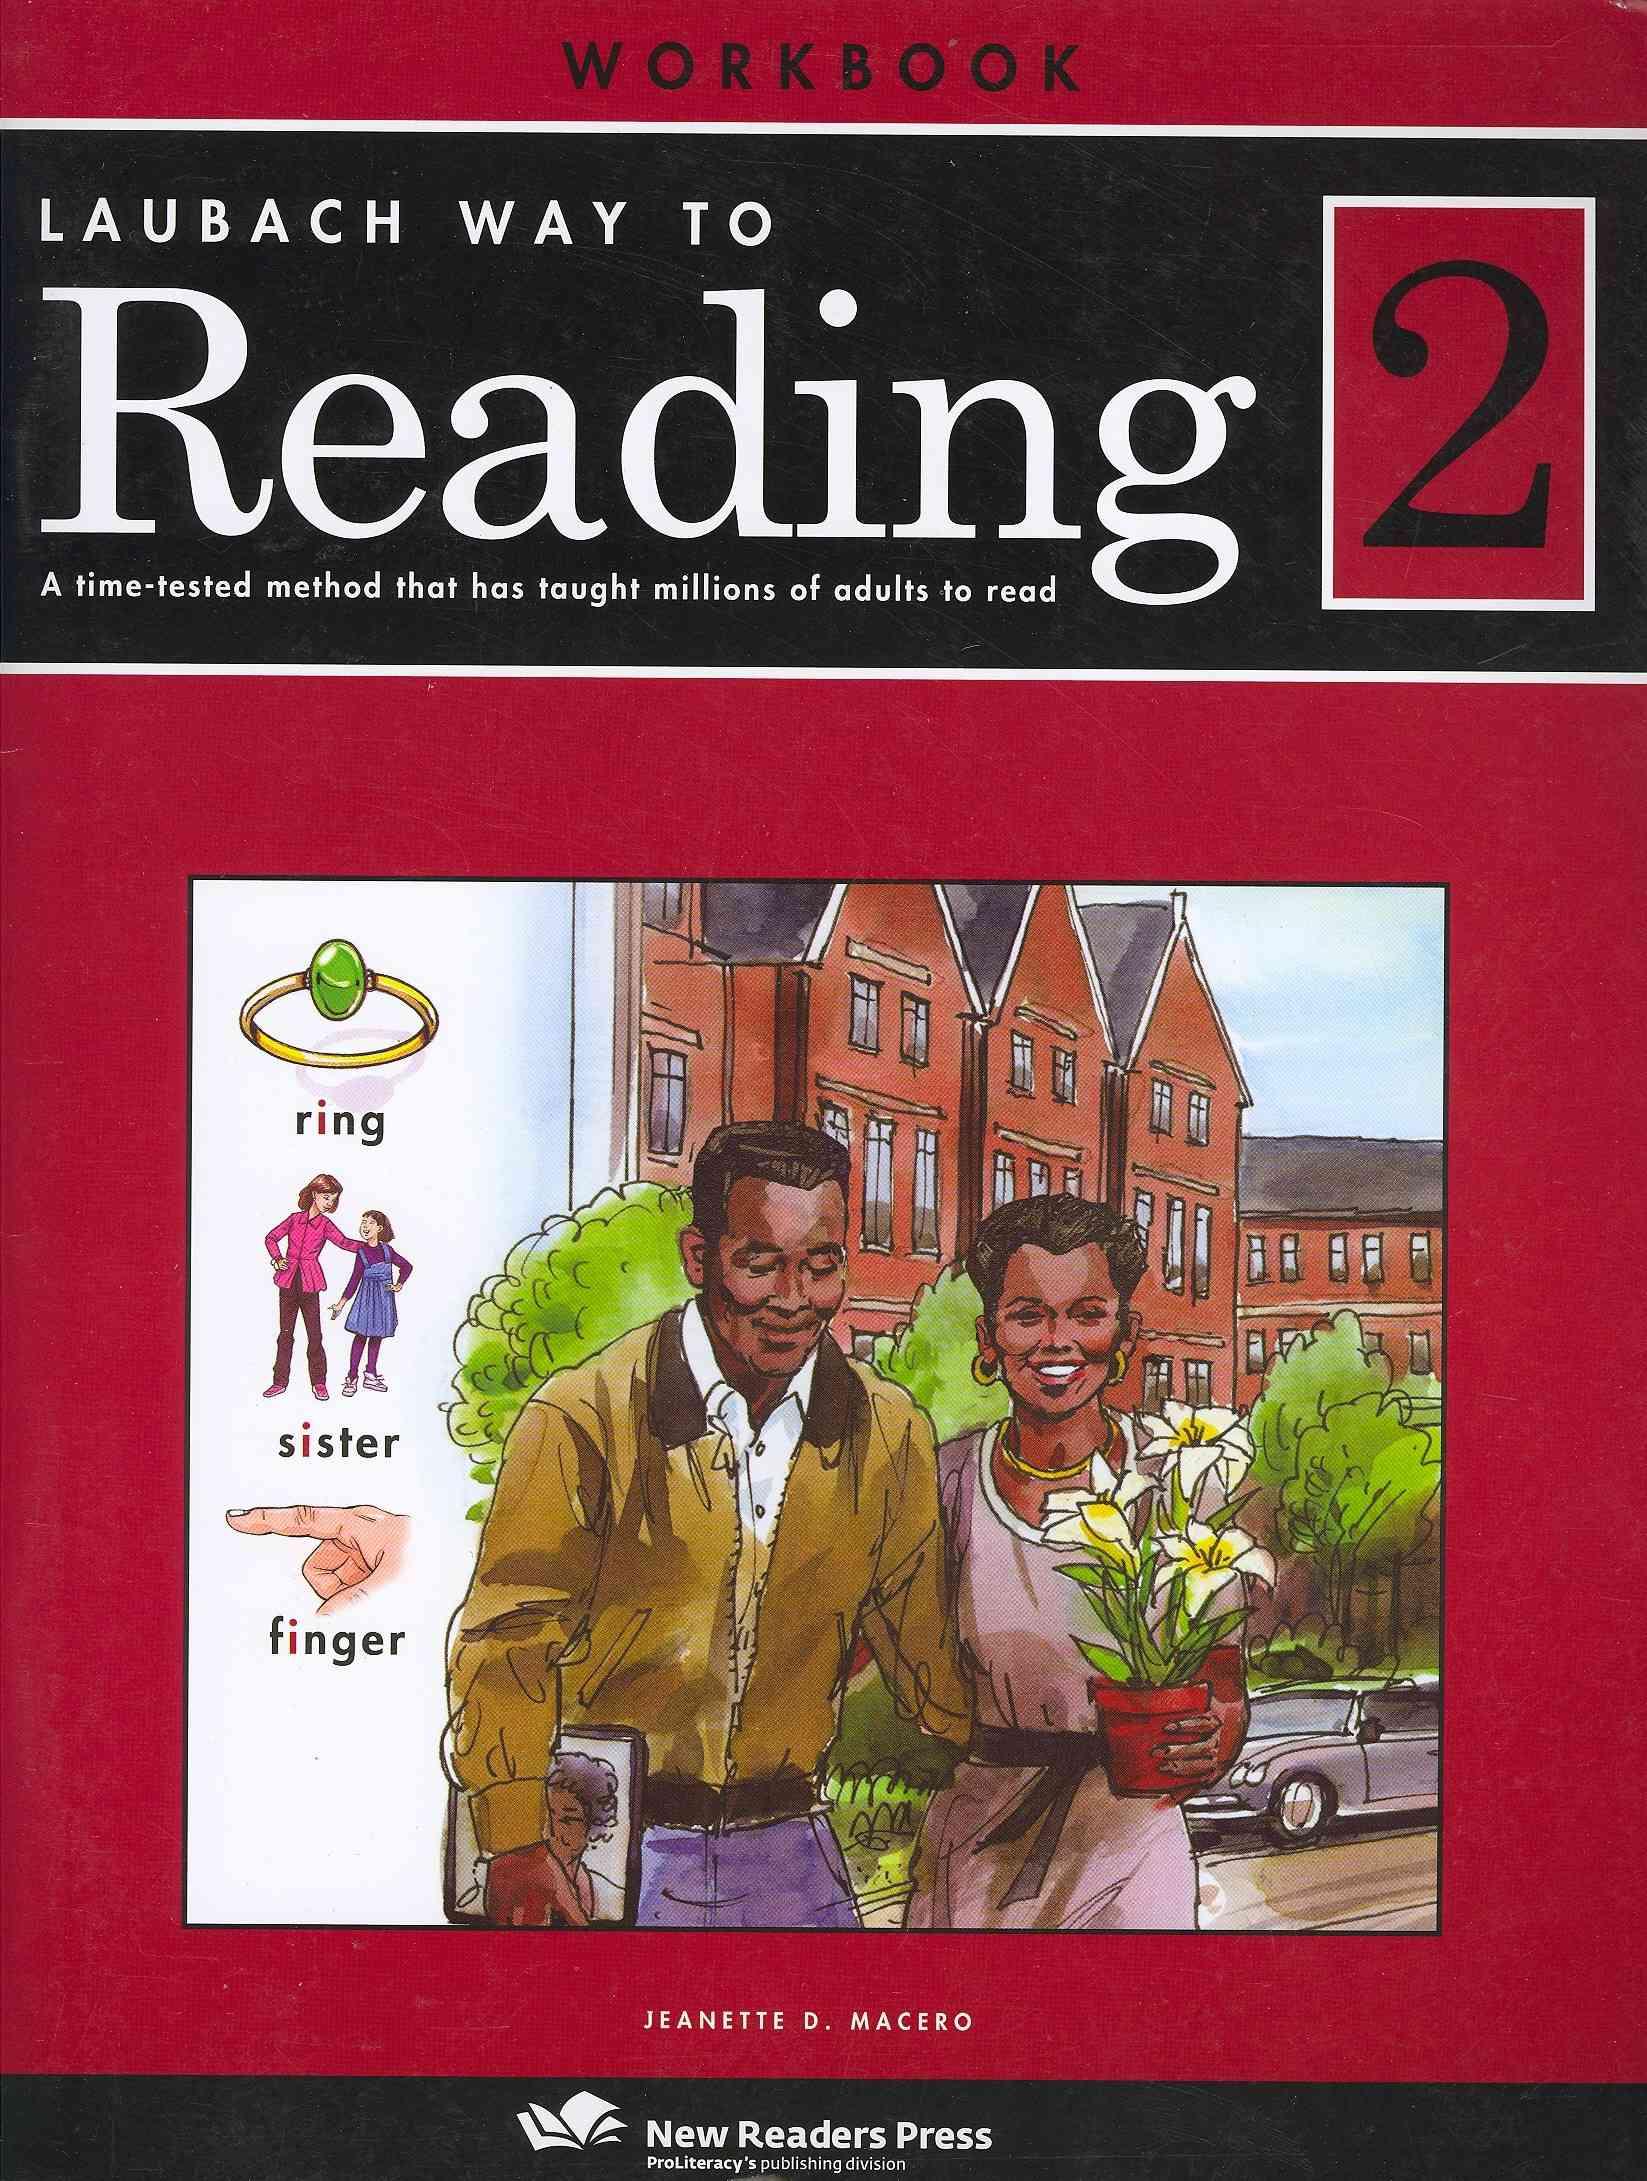 Laubach Way to Reading, Book 2 By Kirk, Elizabeth Mooney